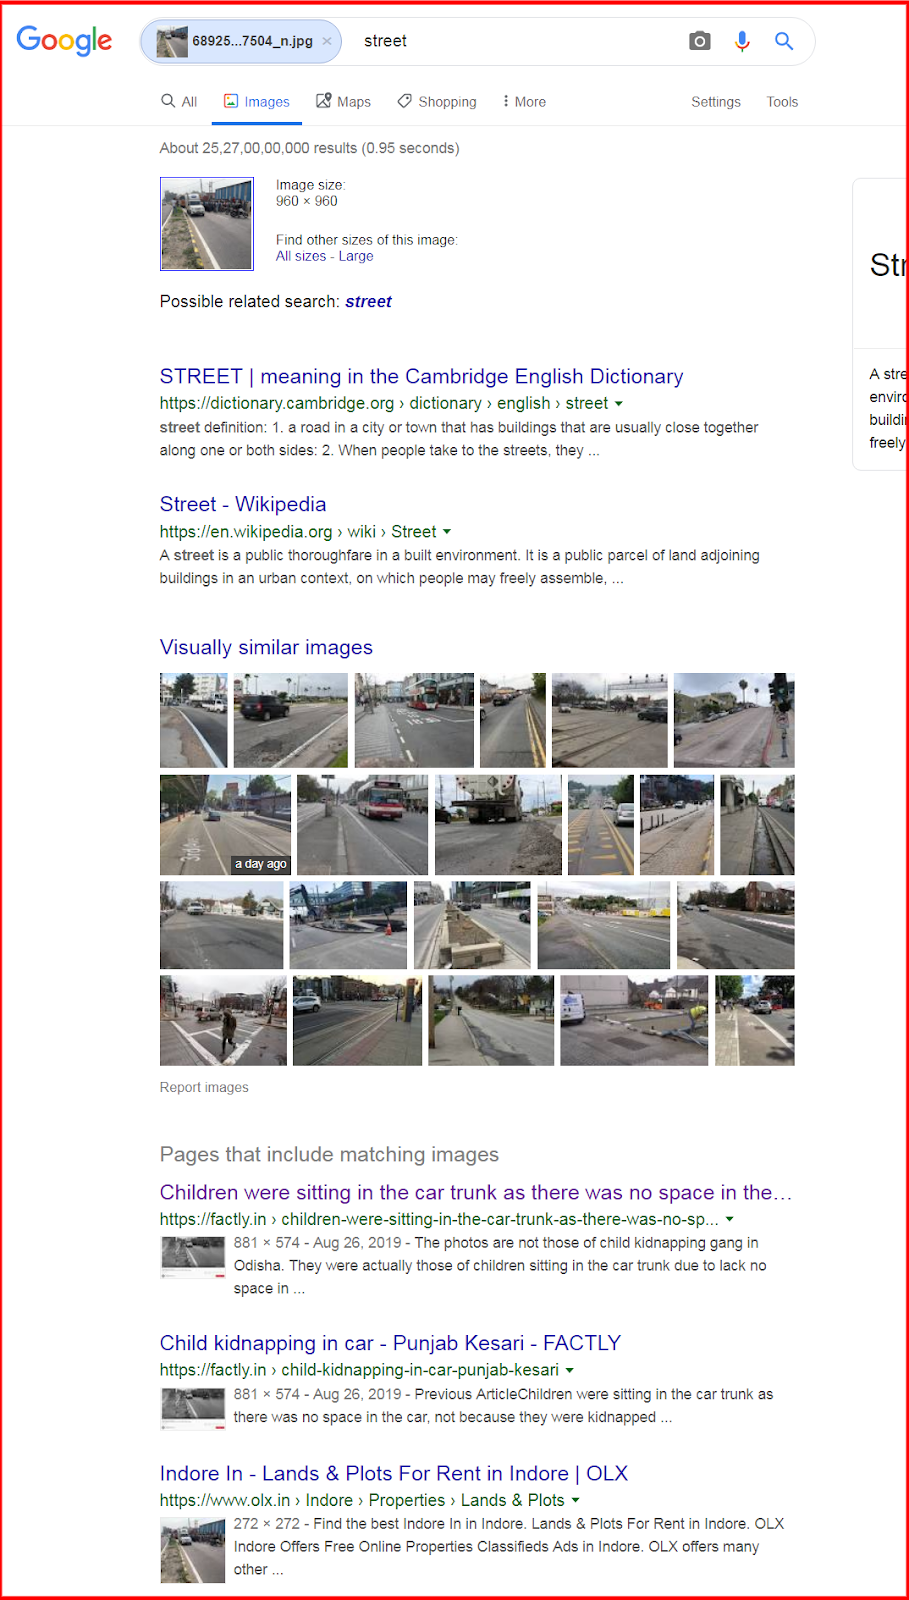 screenshot-www.google.com-2019.09.03-17_31_14.png